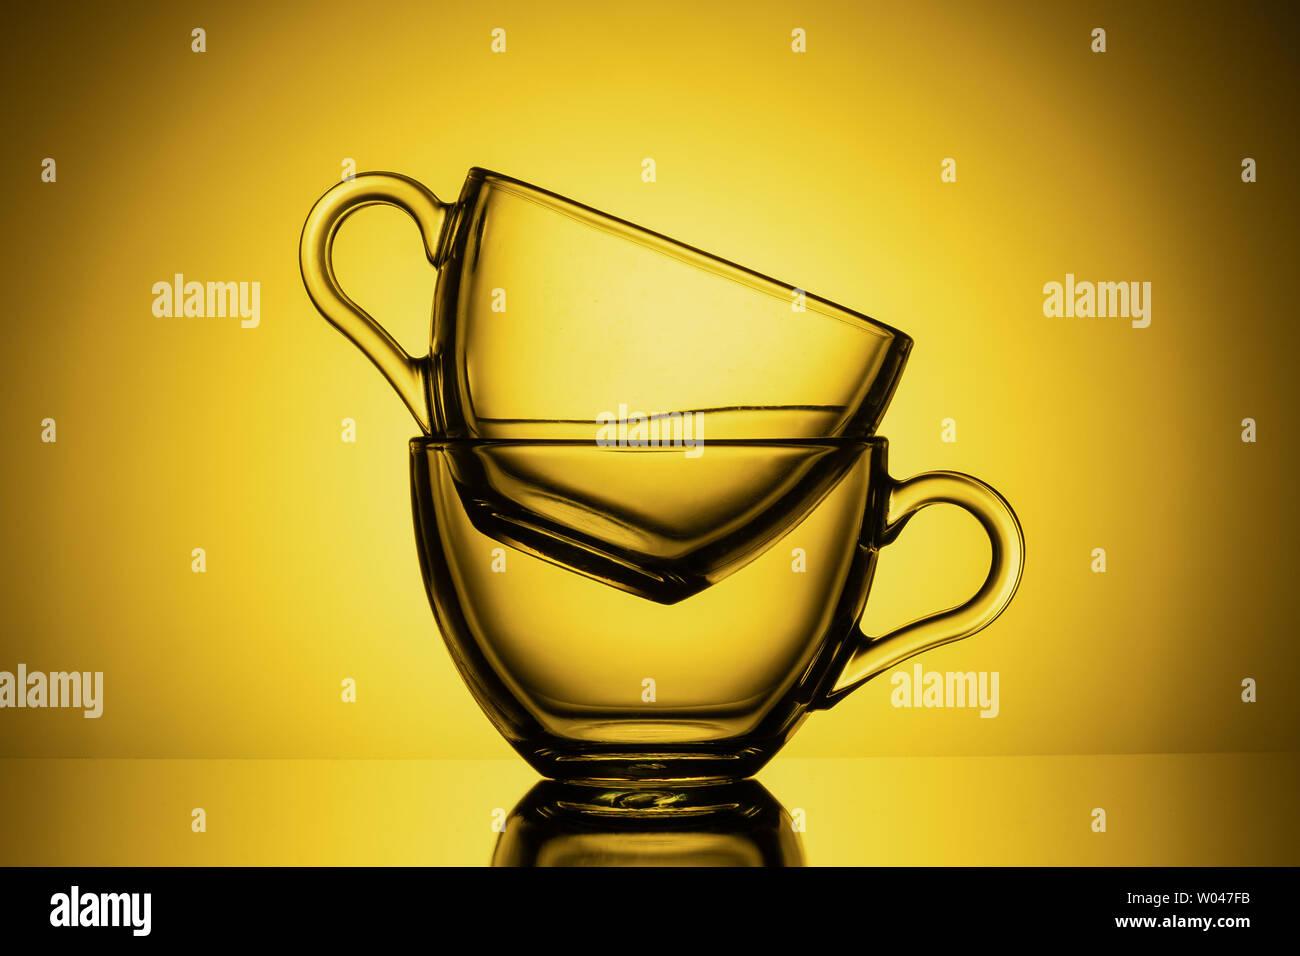 Dos tazas de cristal transparente para el té. Fondo amarillo, close-up, diseño horizontal Foto de stock